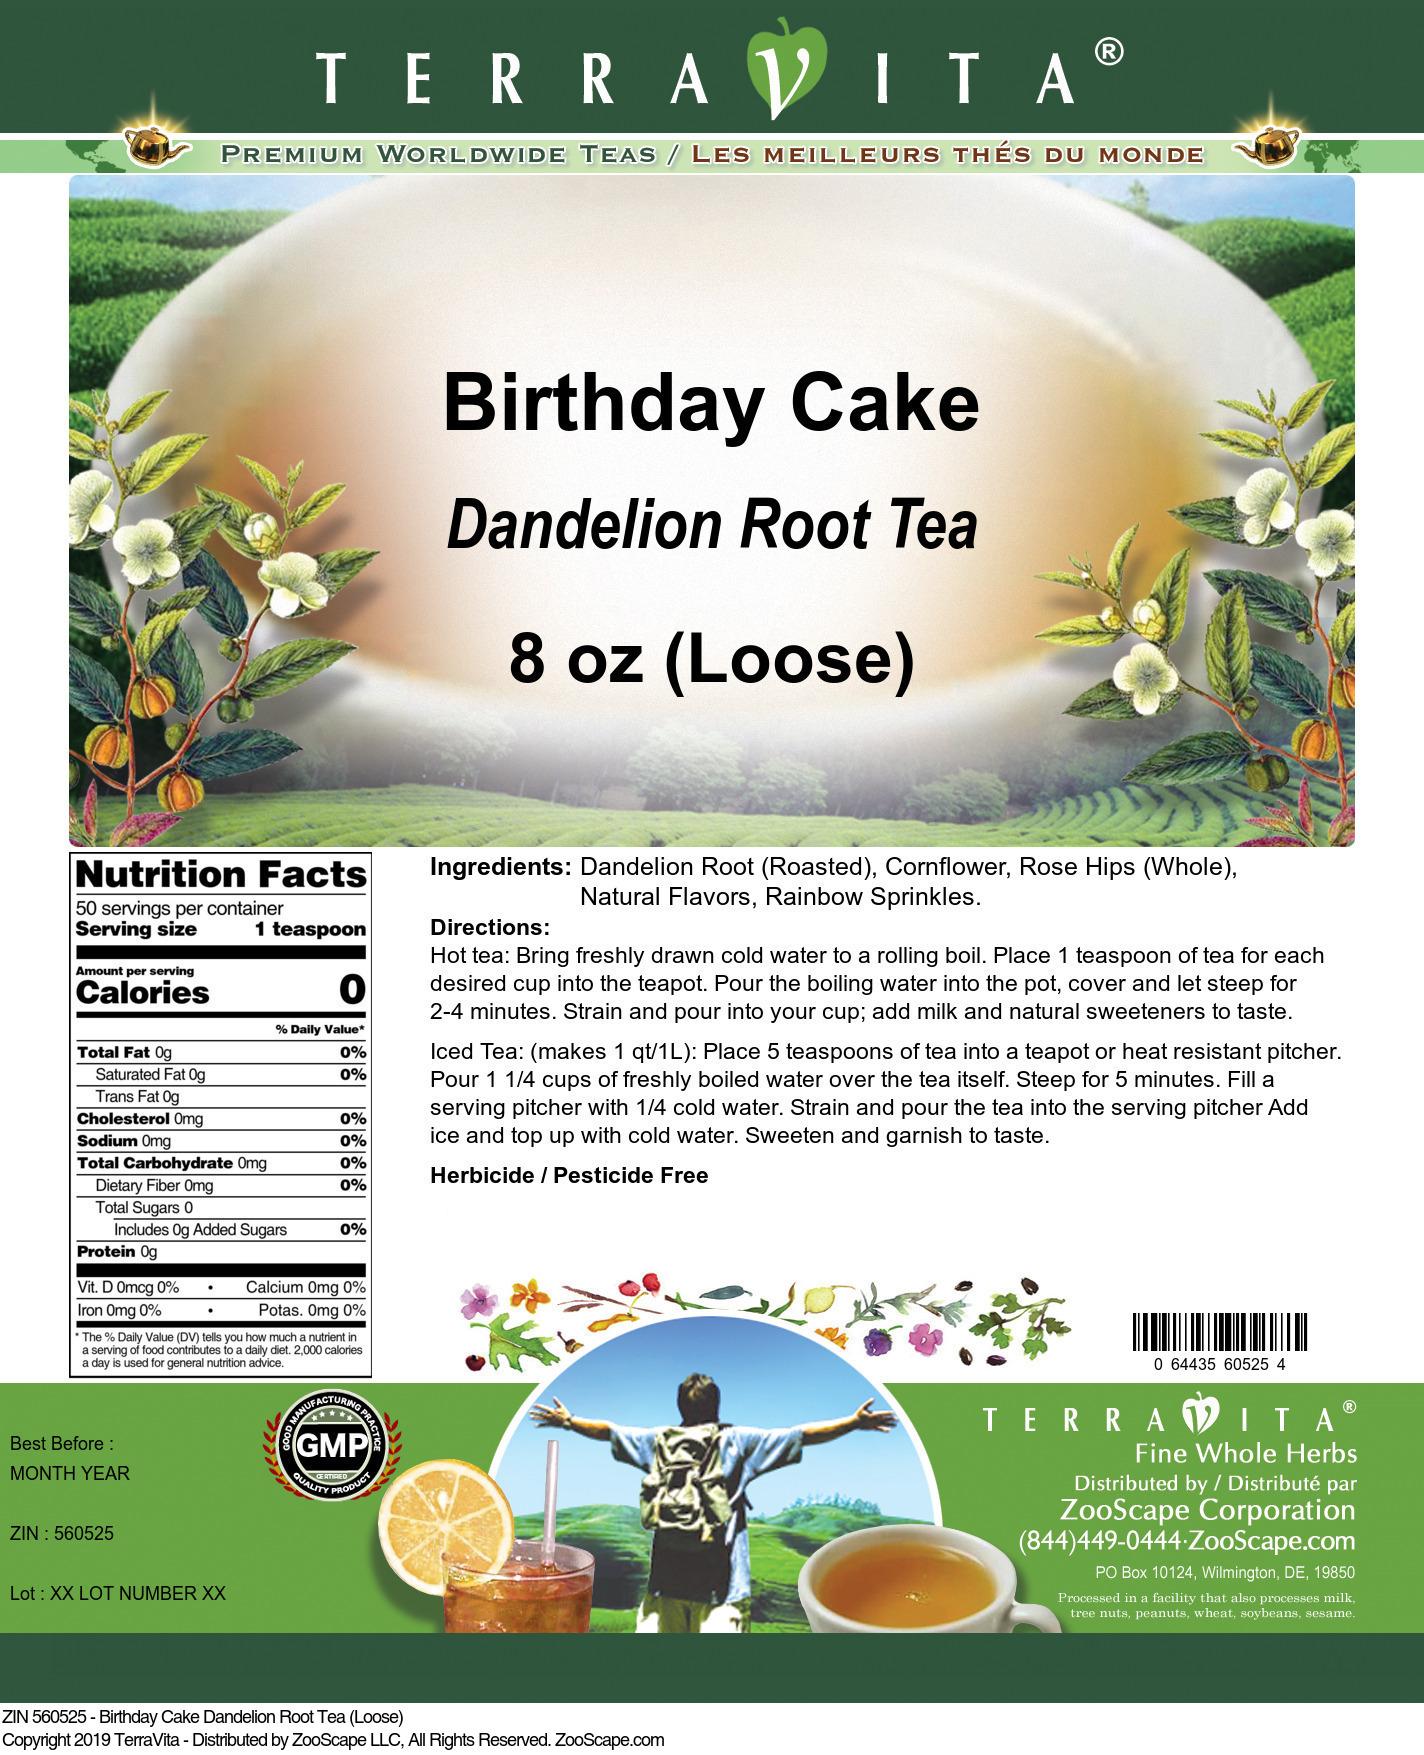 Birthday Cake Dandelion Root Tea (Loose)